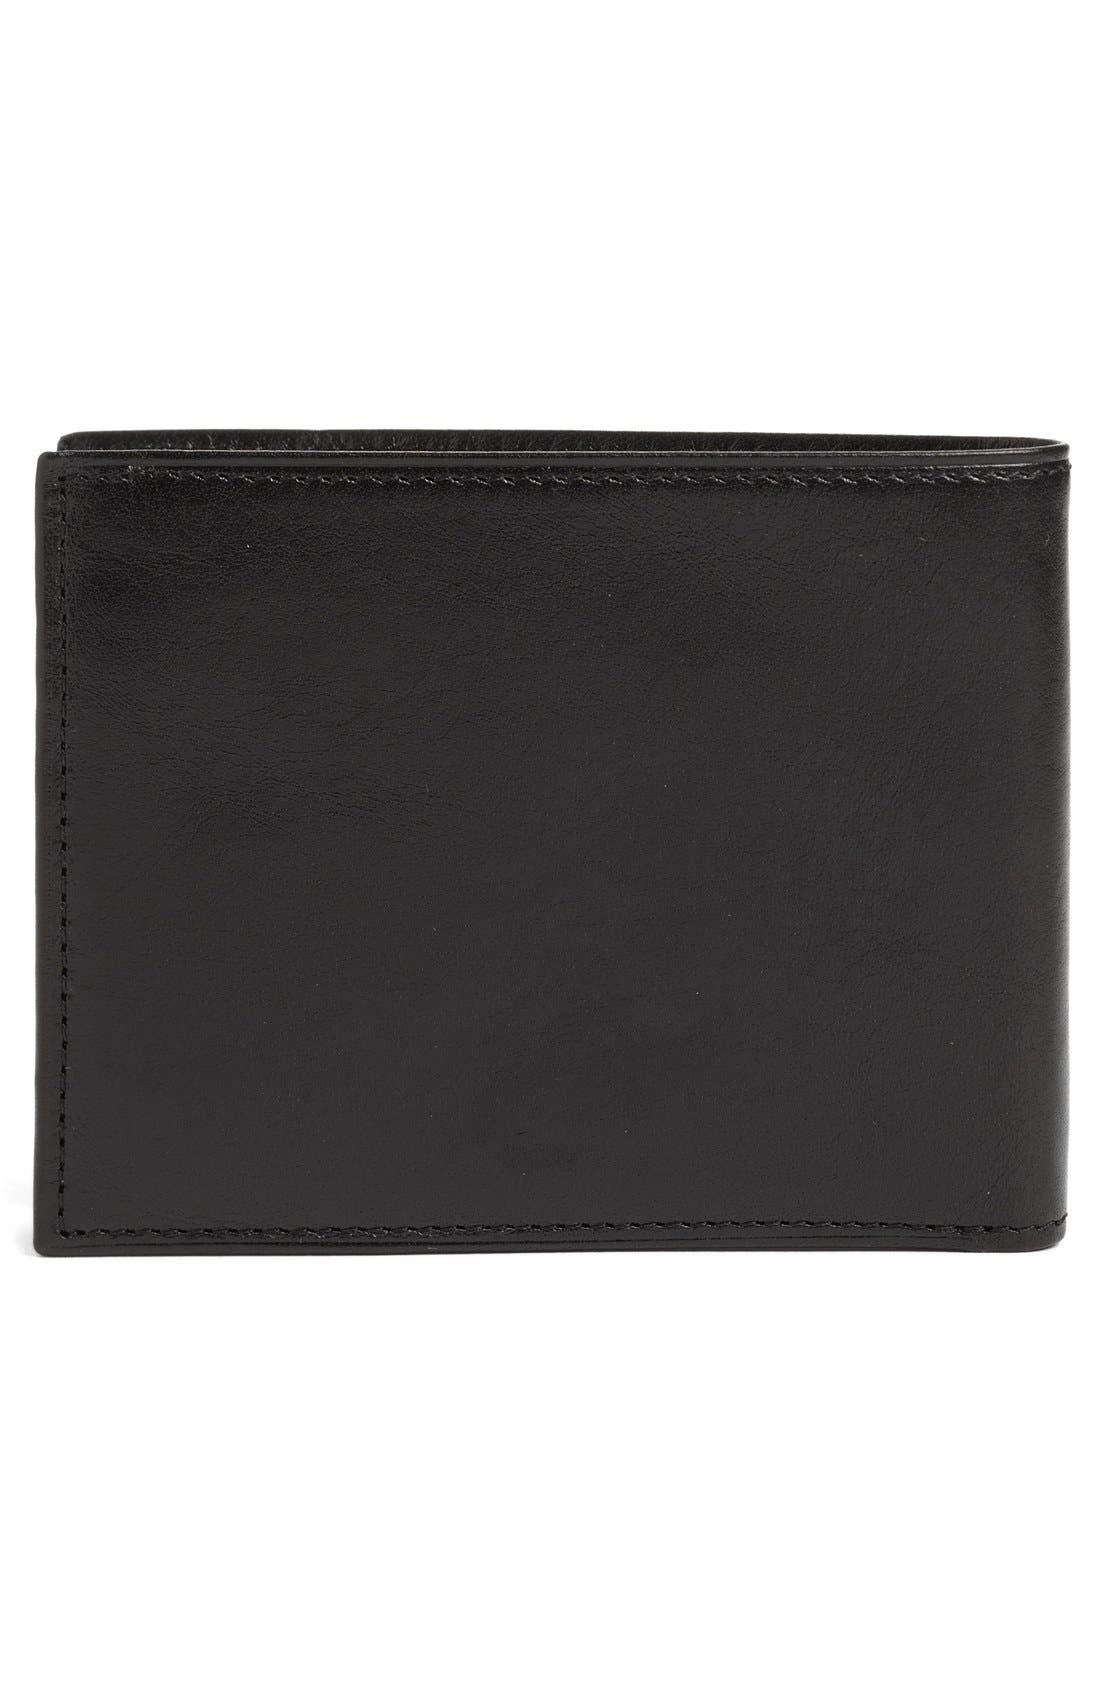 Alternate Image 3  - Bosca Leather Bifold Wallet